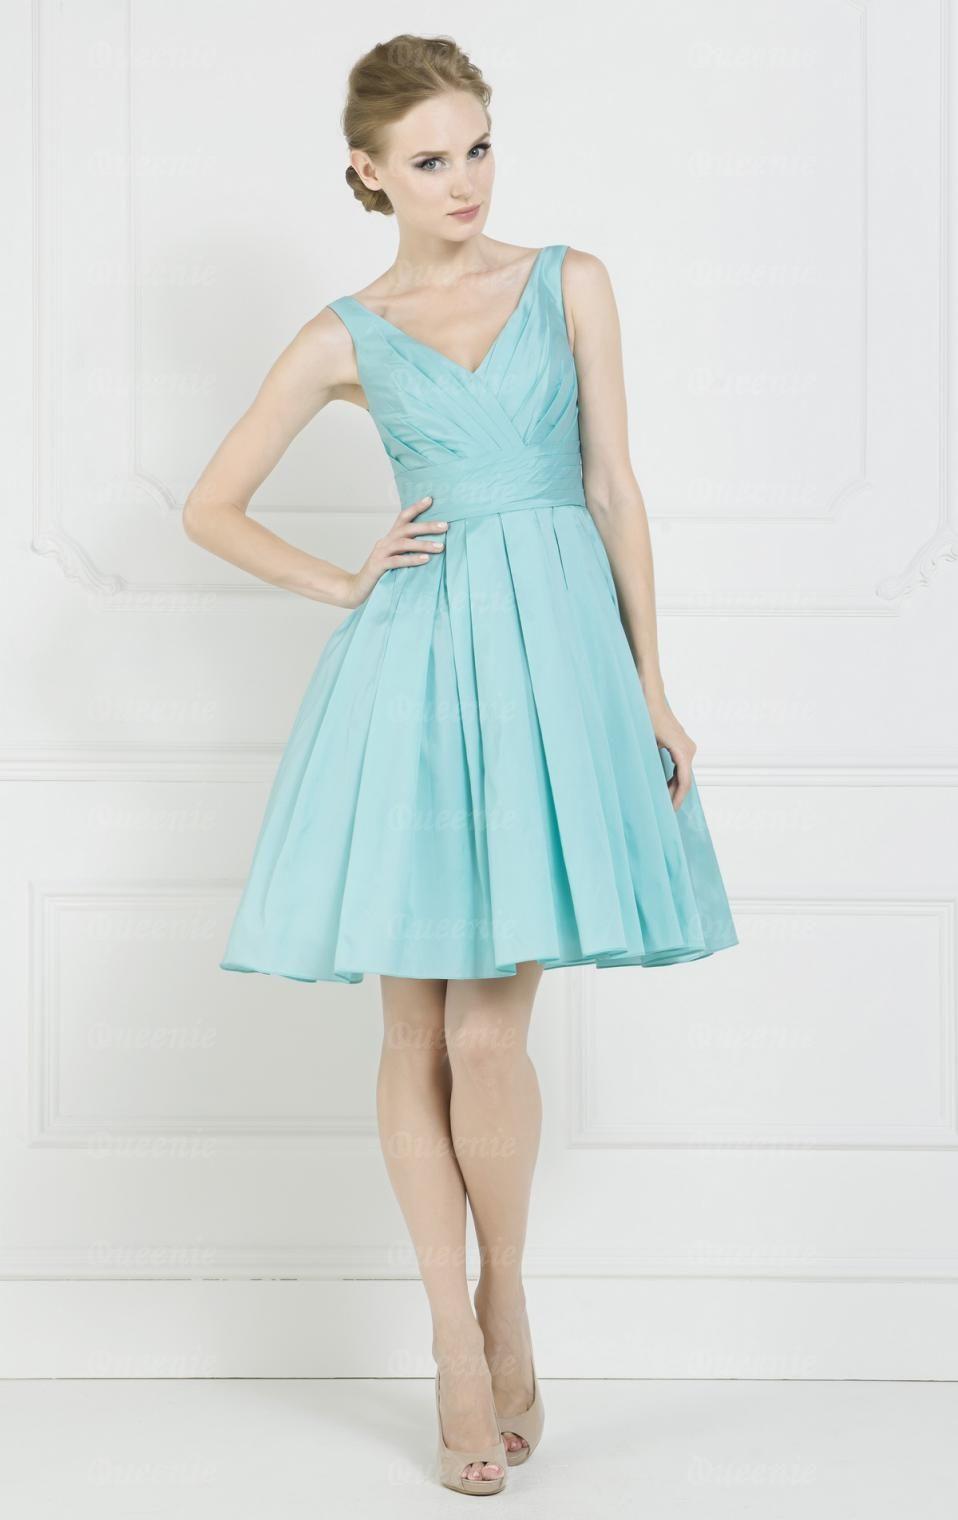 Vintage bridesmaid dresses short bridesmaid dresses pinterest vintage bridesmaid dresses short ombrellifo Images